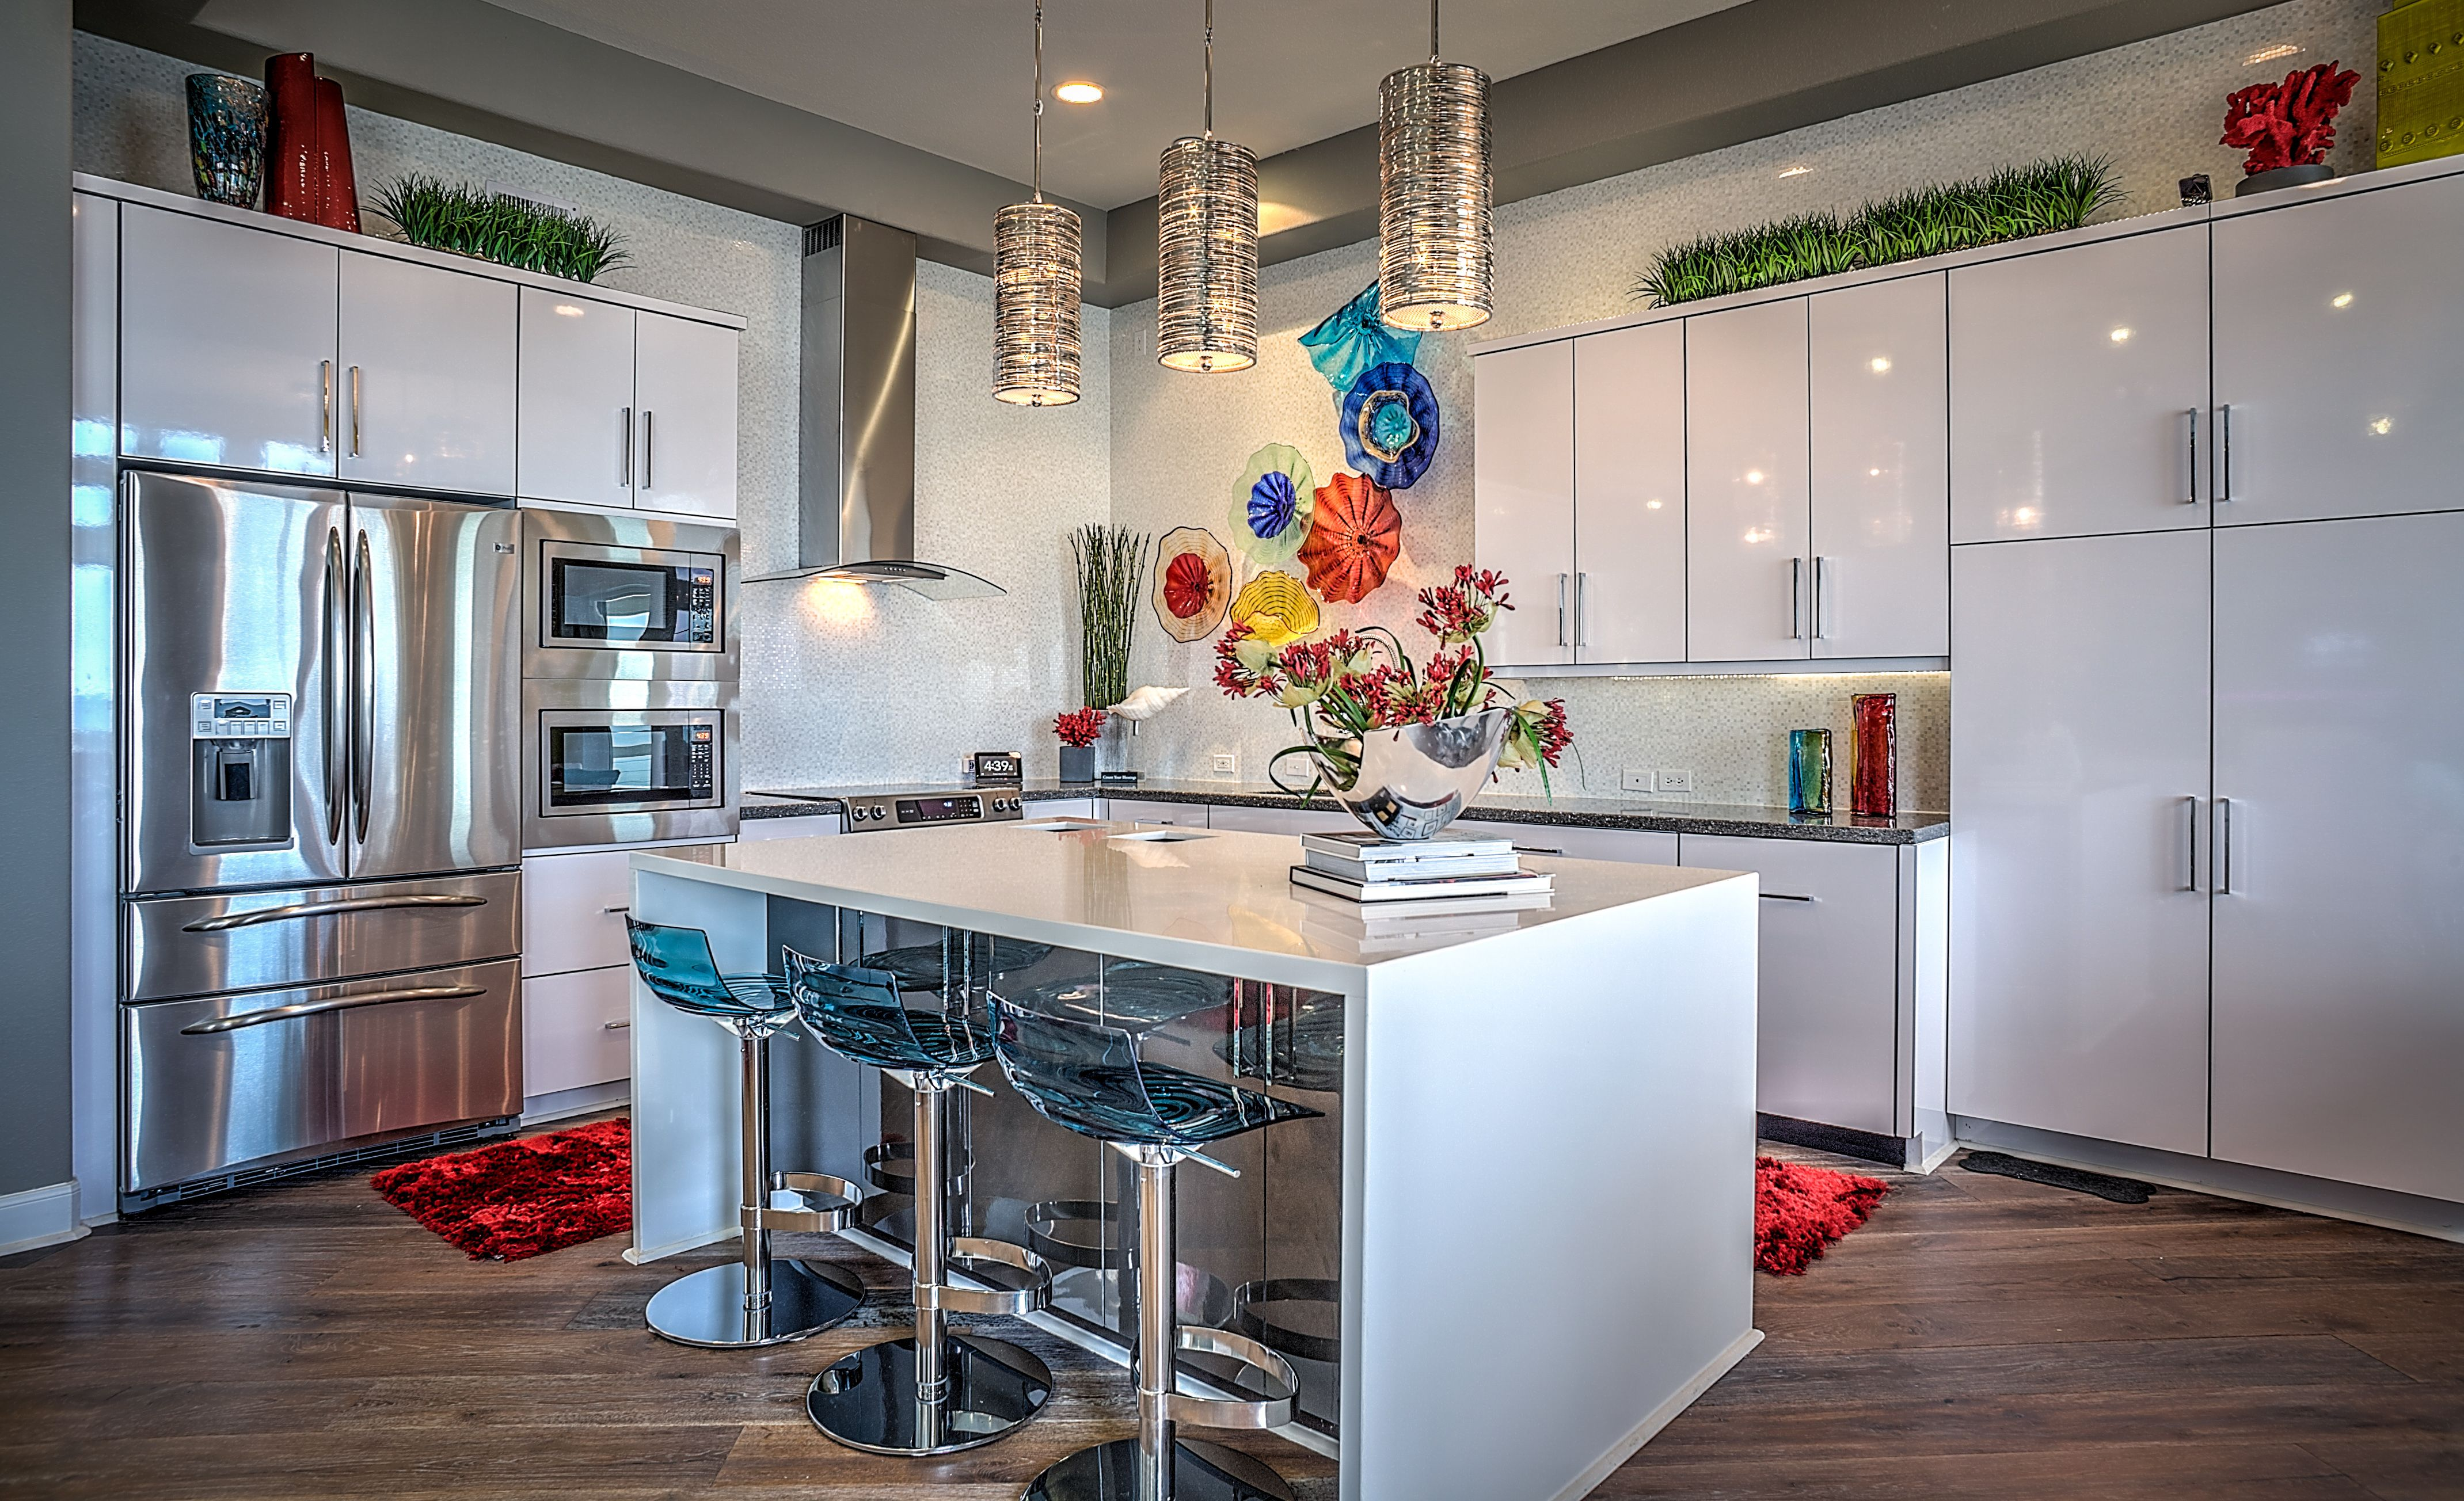 Designed By The Design Firm In Stafford, Texas #Interiors  #Interiordesignideas